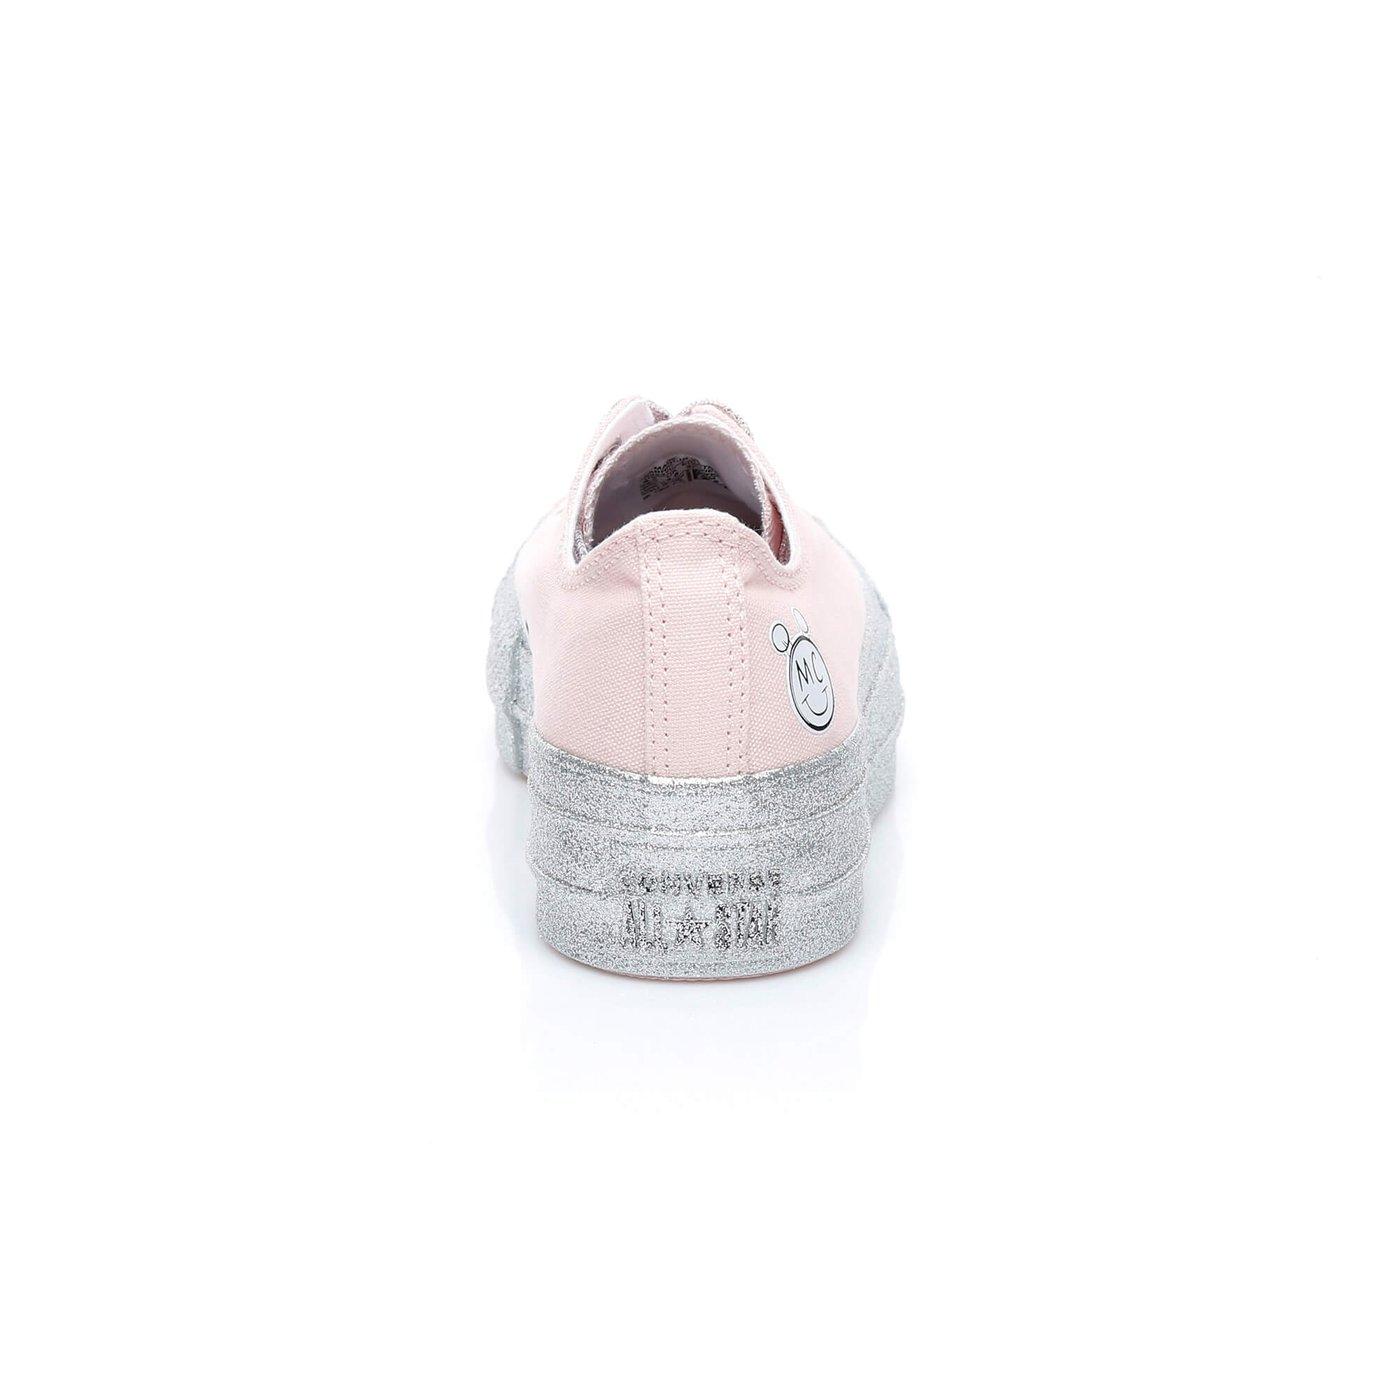 Converse X Miley Cyrus Chuck Taylor 'Glitter'' High Lift Kadın Pembe Sneaker